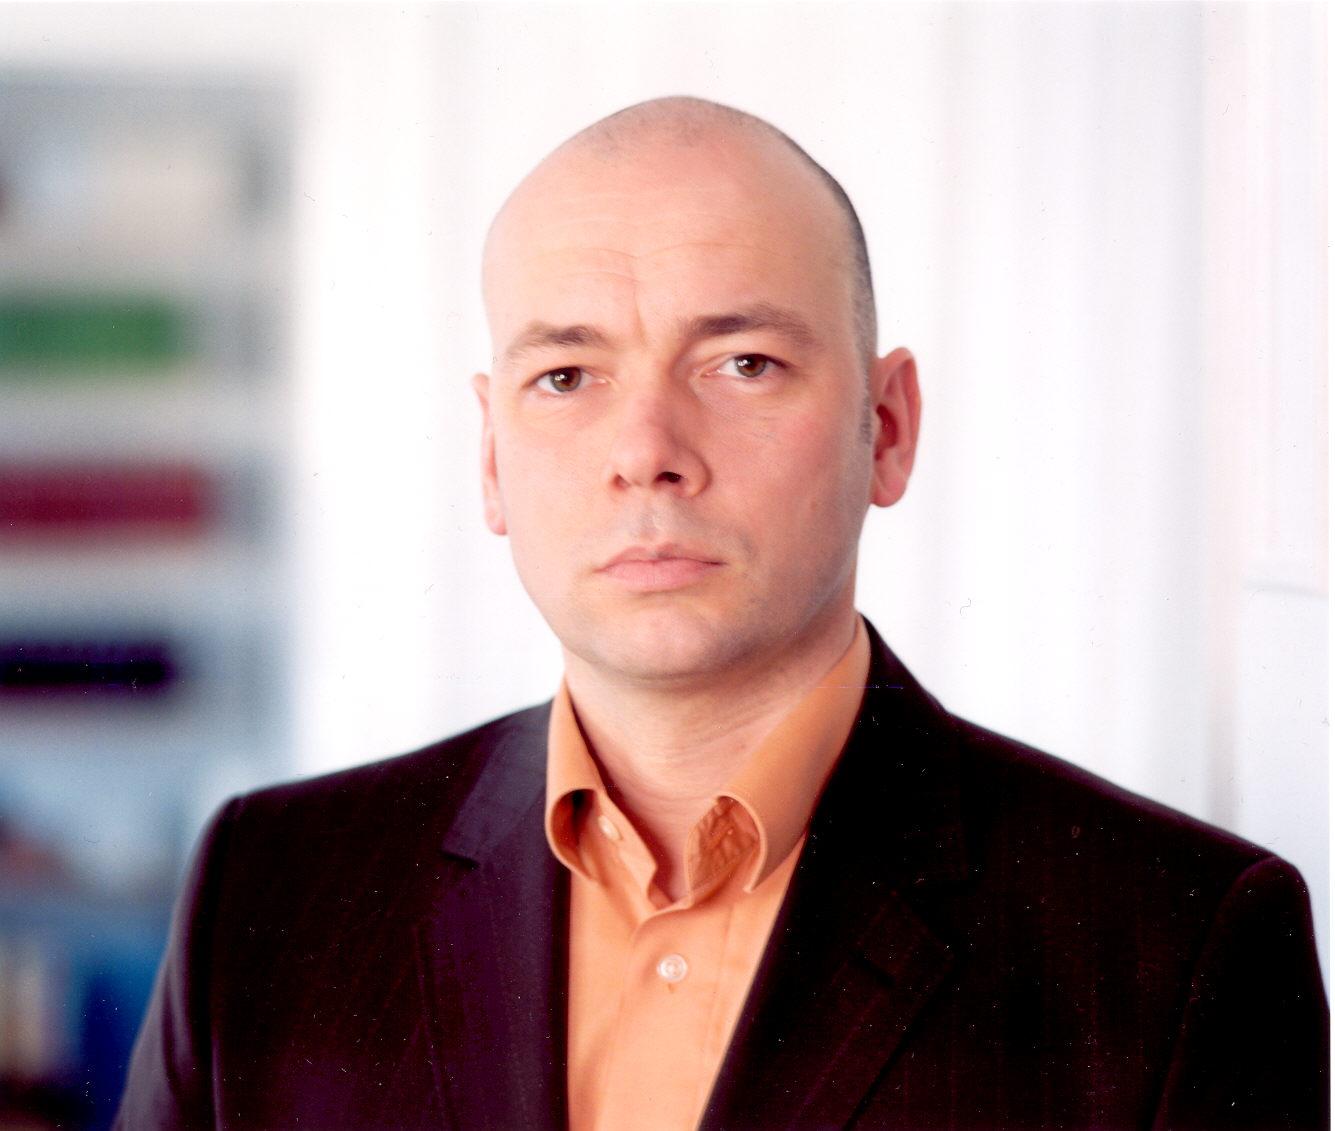 Arno Orzessek